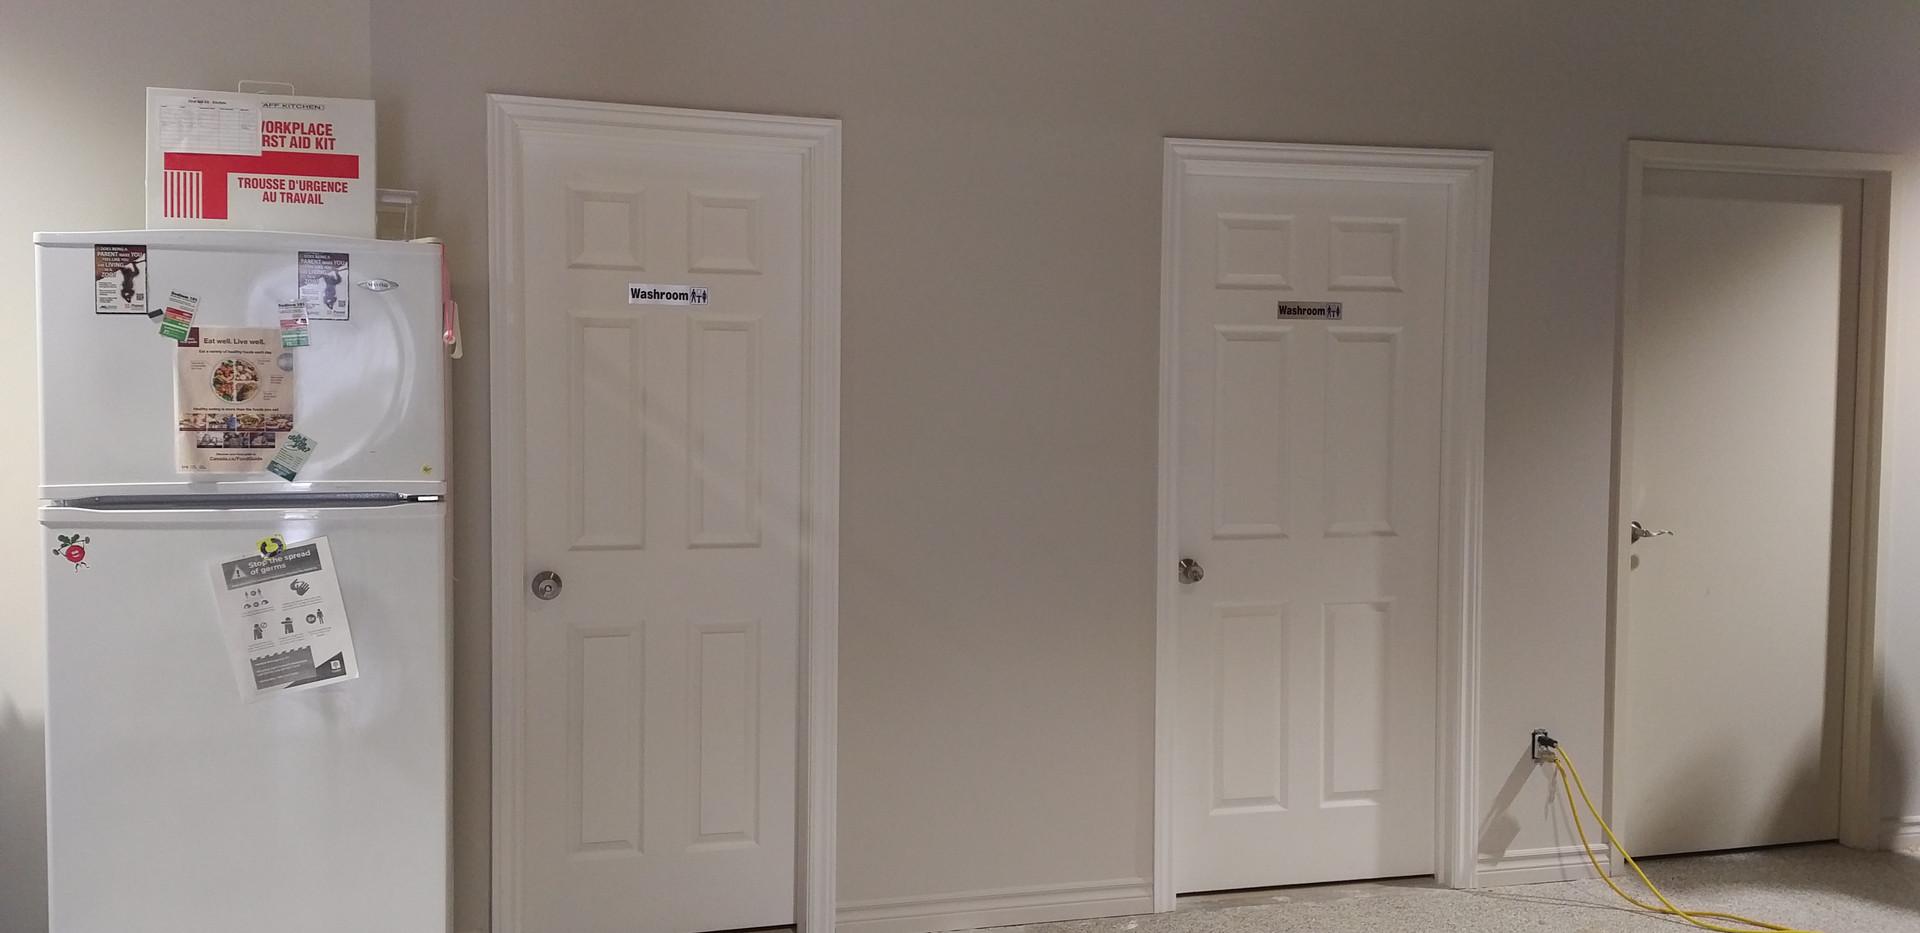 Washroom Entrances.jpg